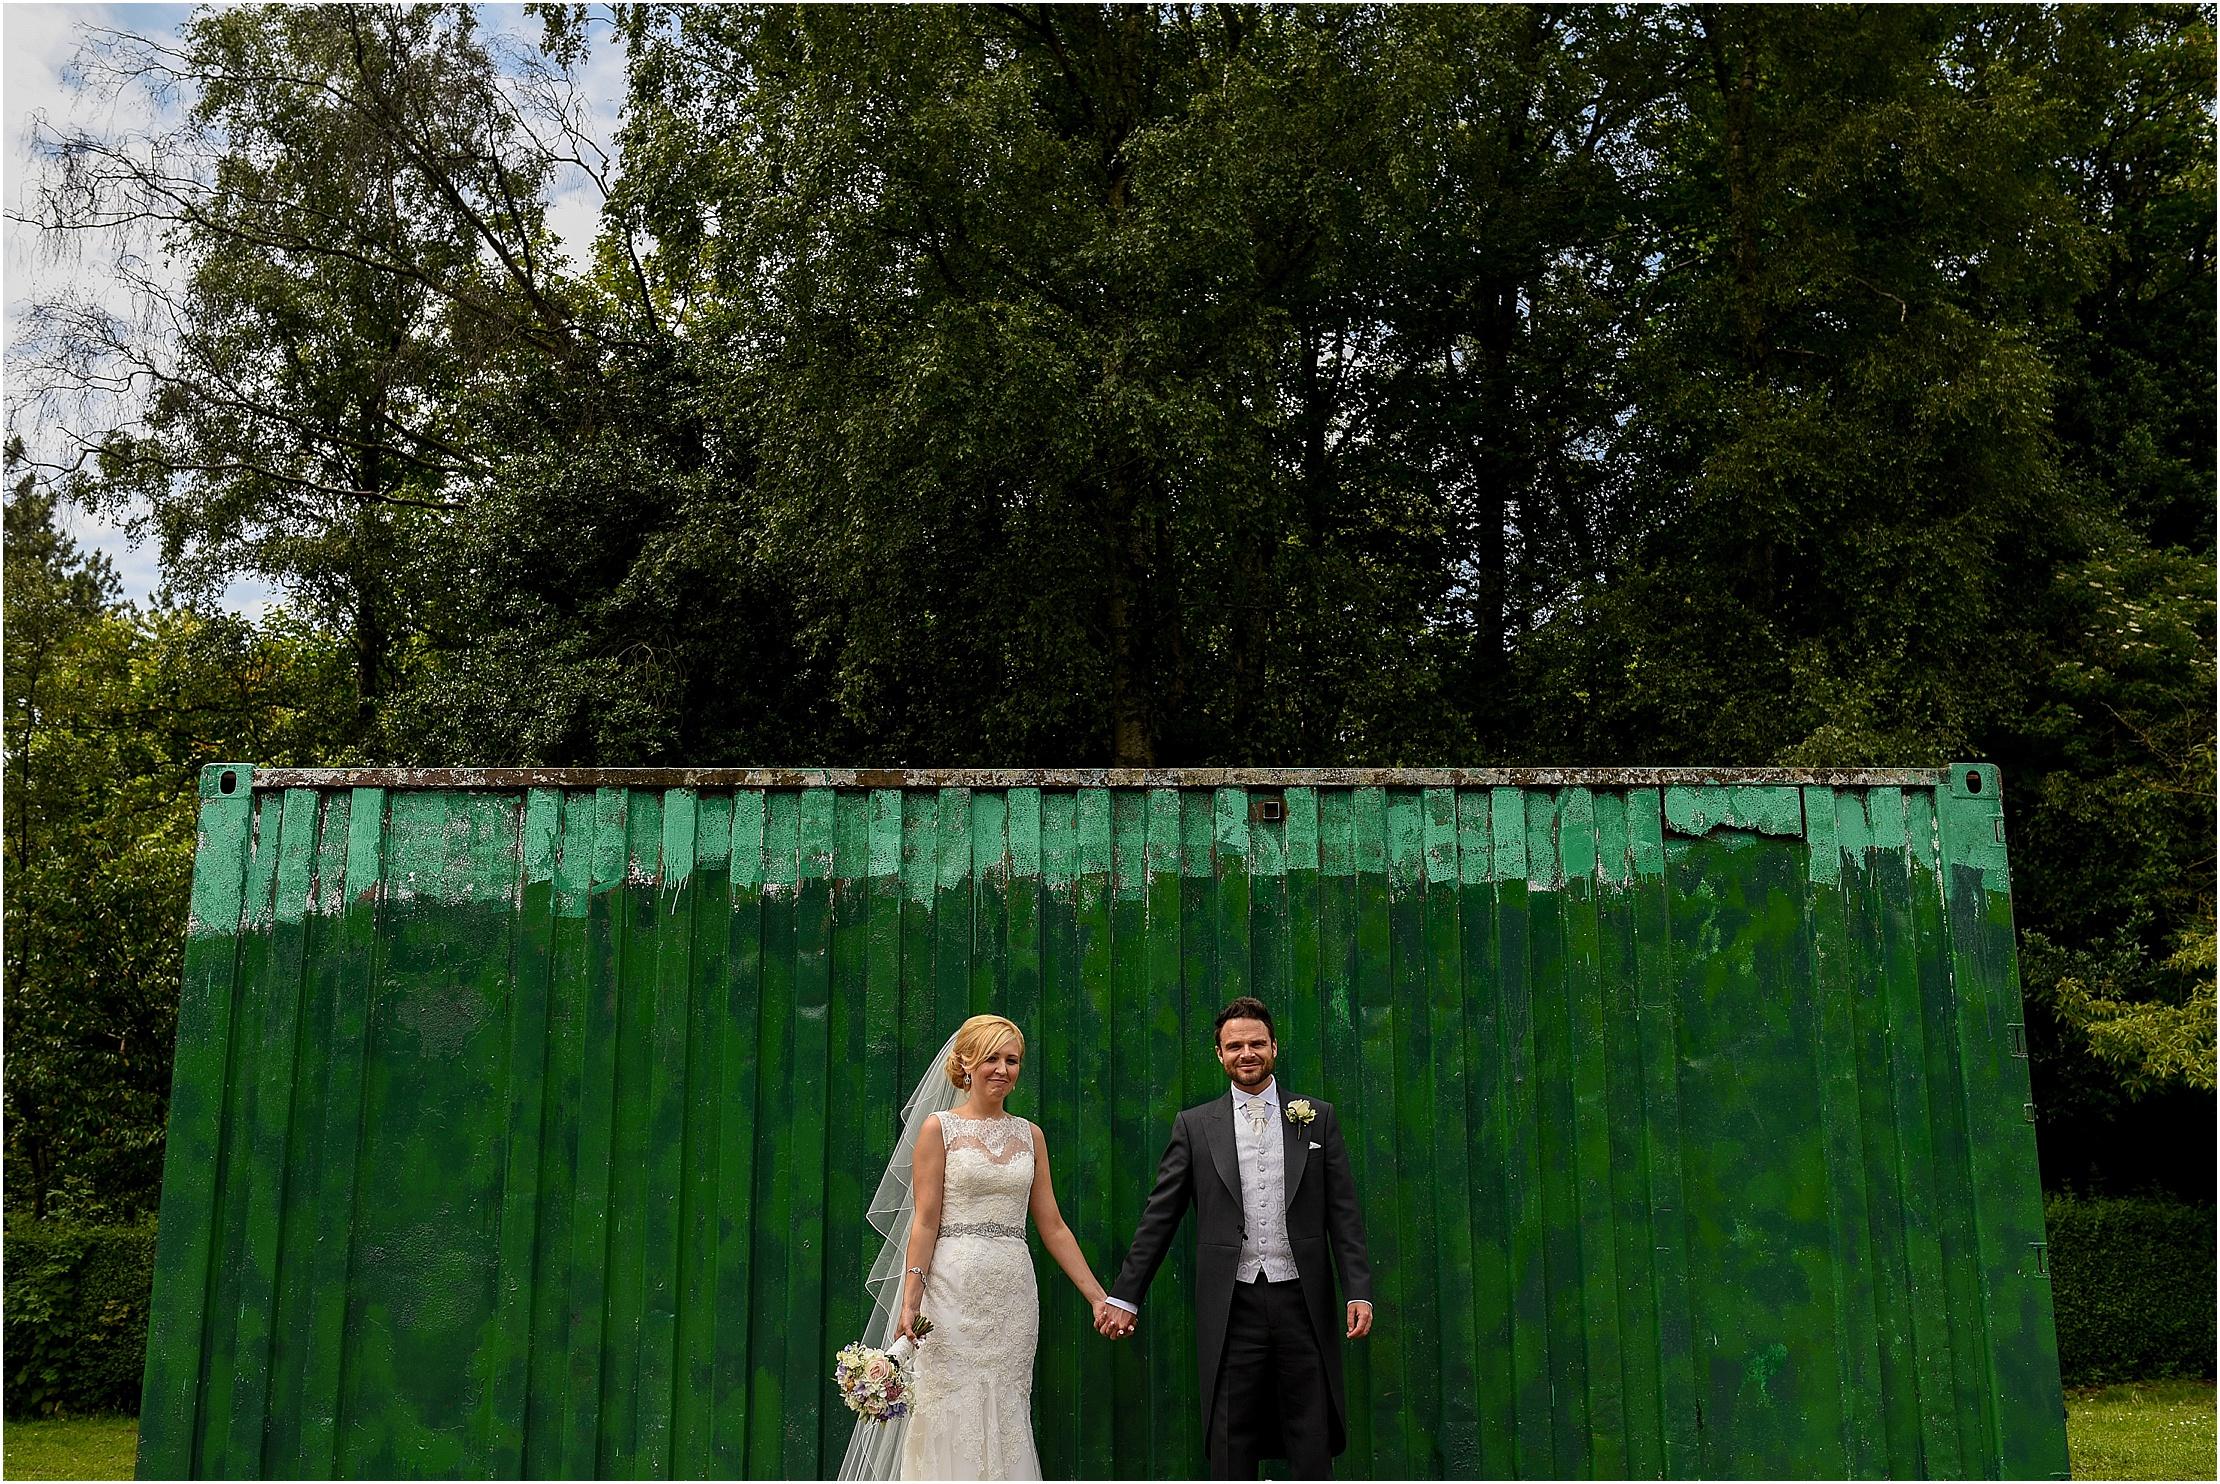 staining-lodge-wedding-086.jpg